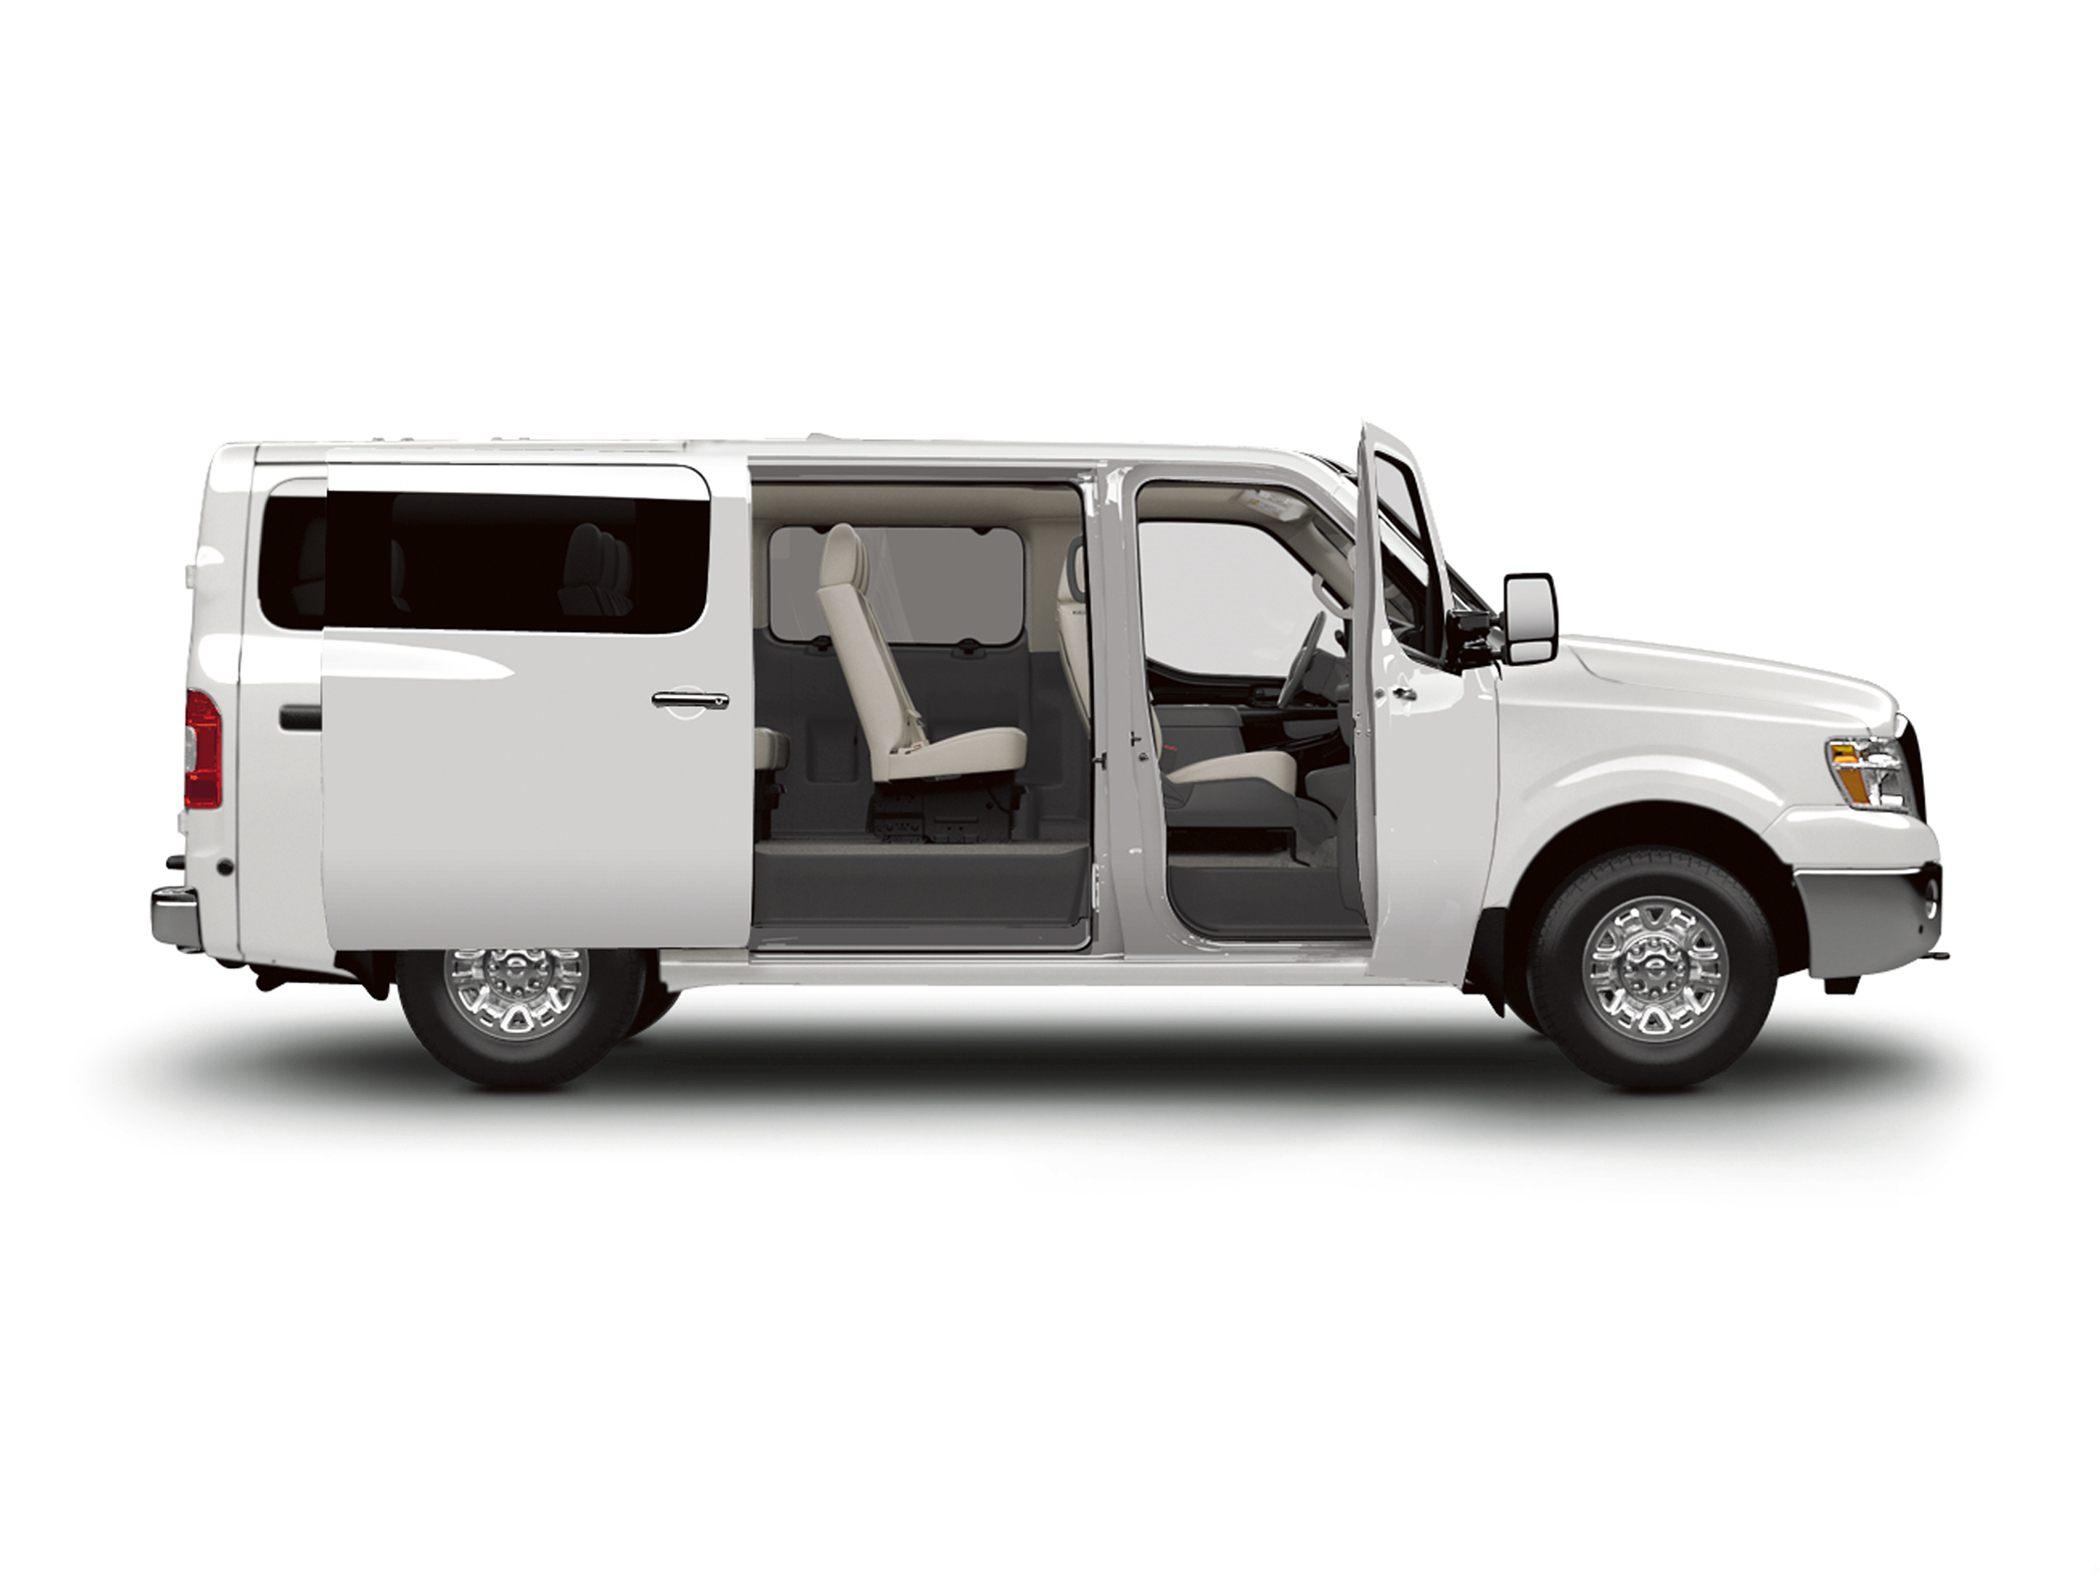 2012 Nissan NV - Information and photos - MOMENTcar